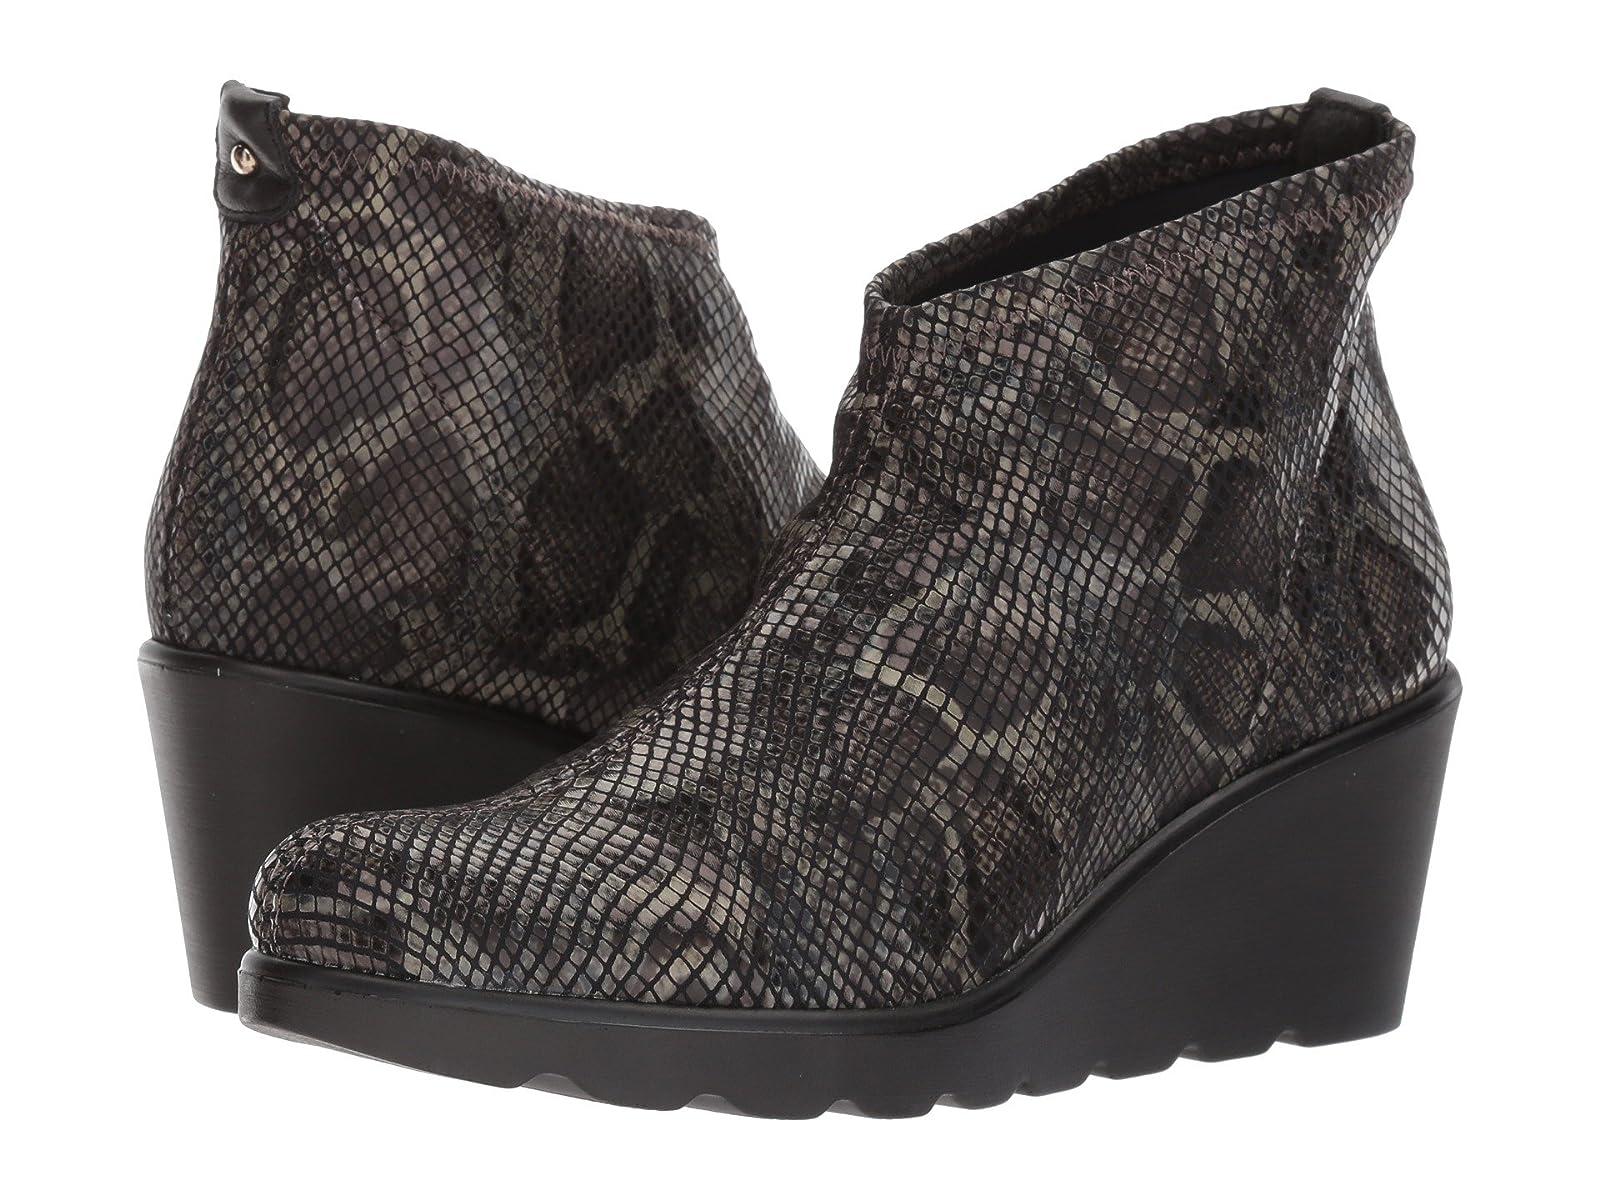 Toni Pons Baltic-LsCheap and distinctive eye-catching shoes